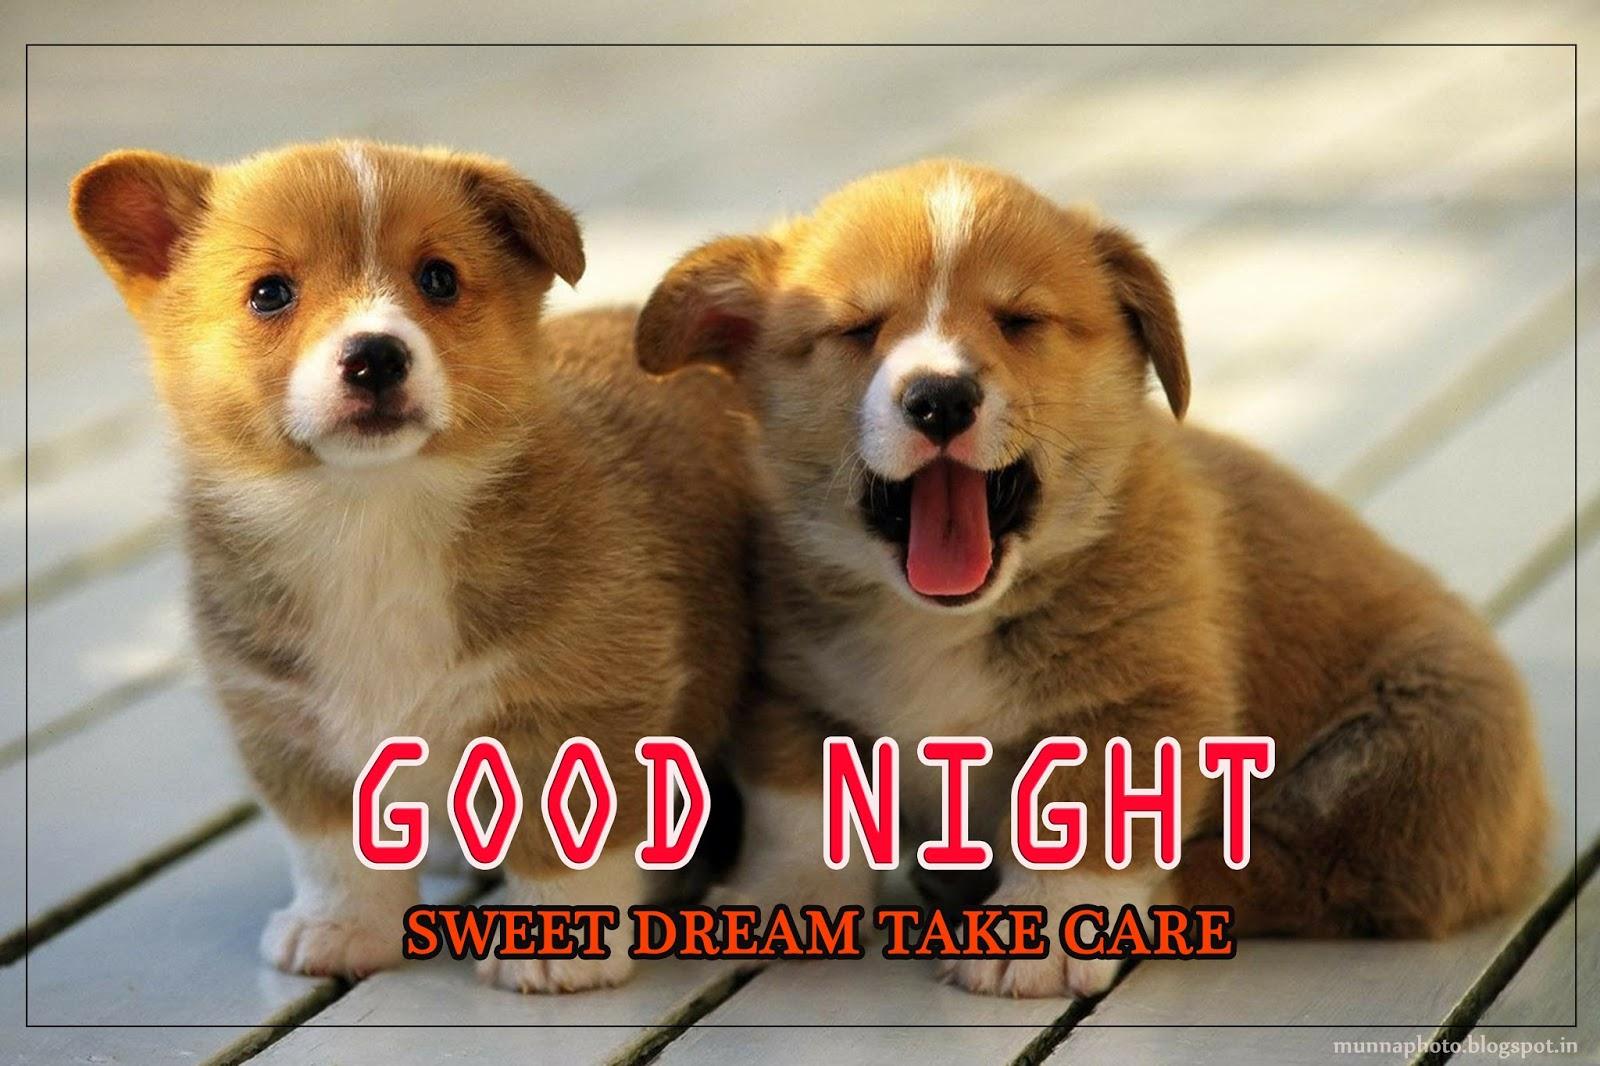 Munna Photo: Ifel Tower - dog -good night wallpaper